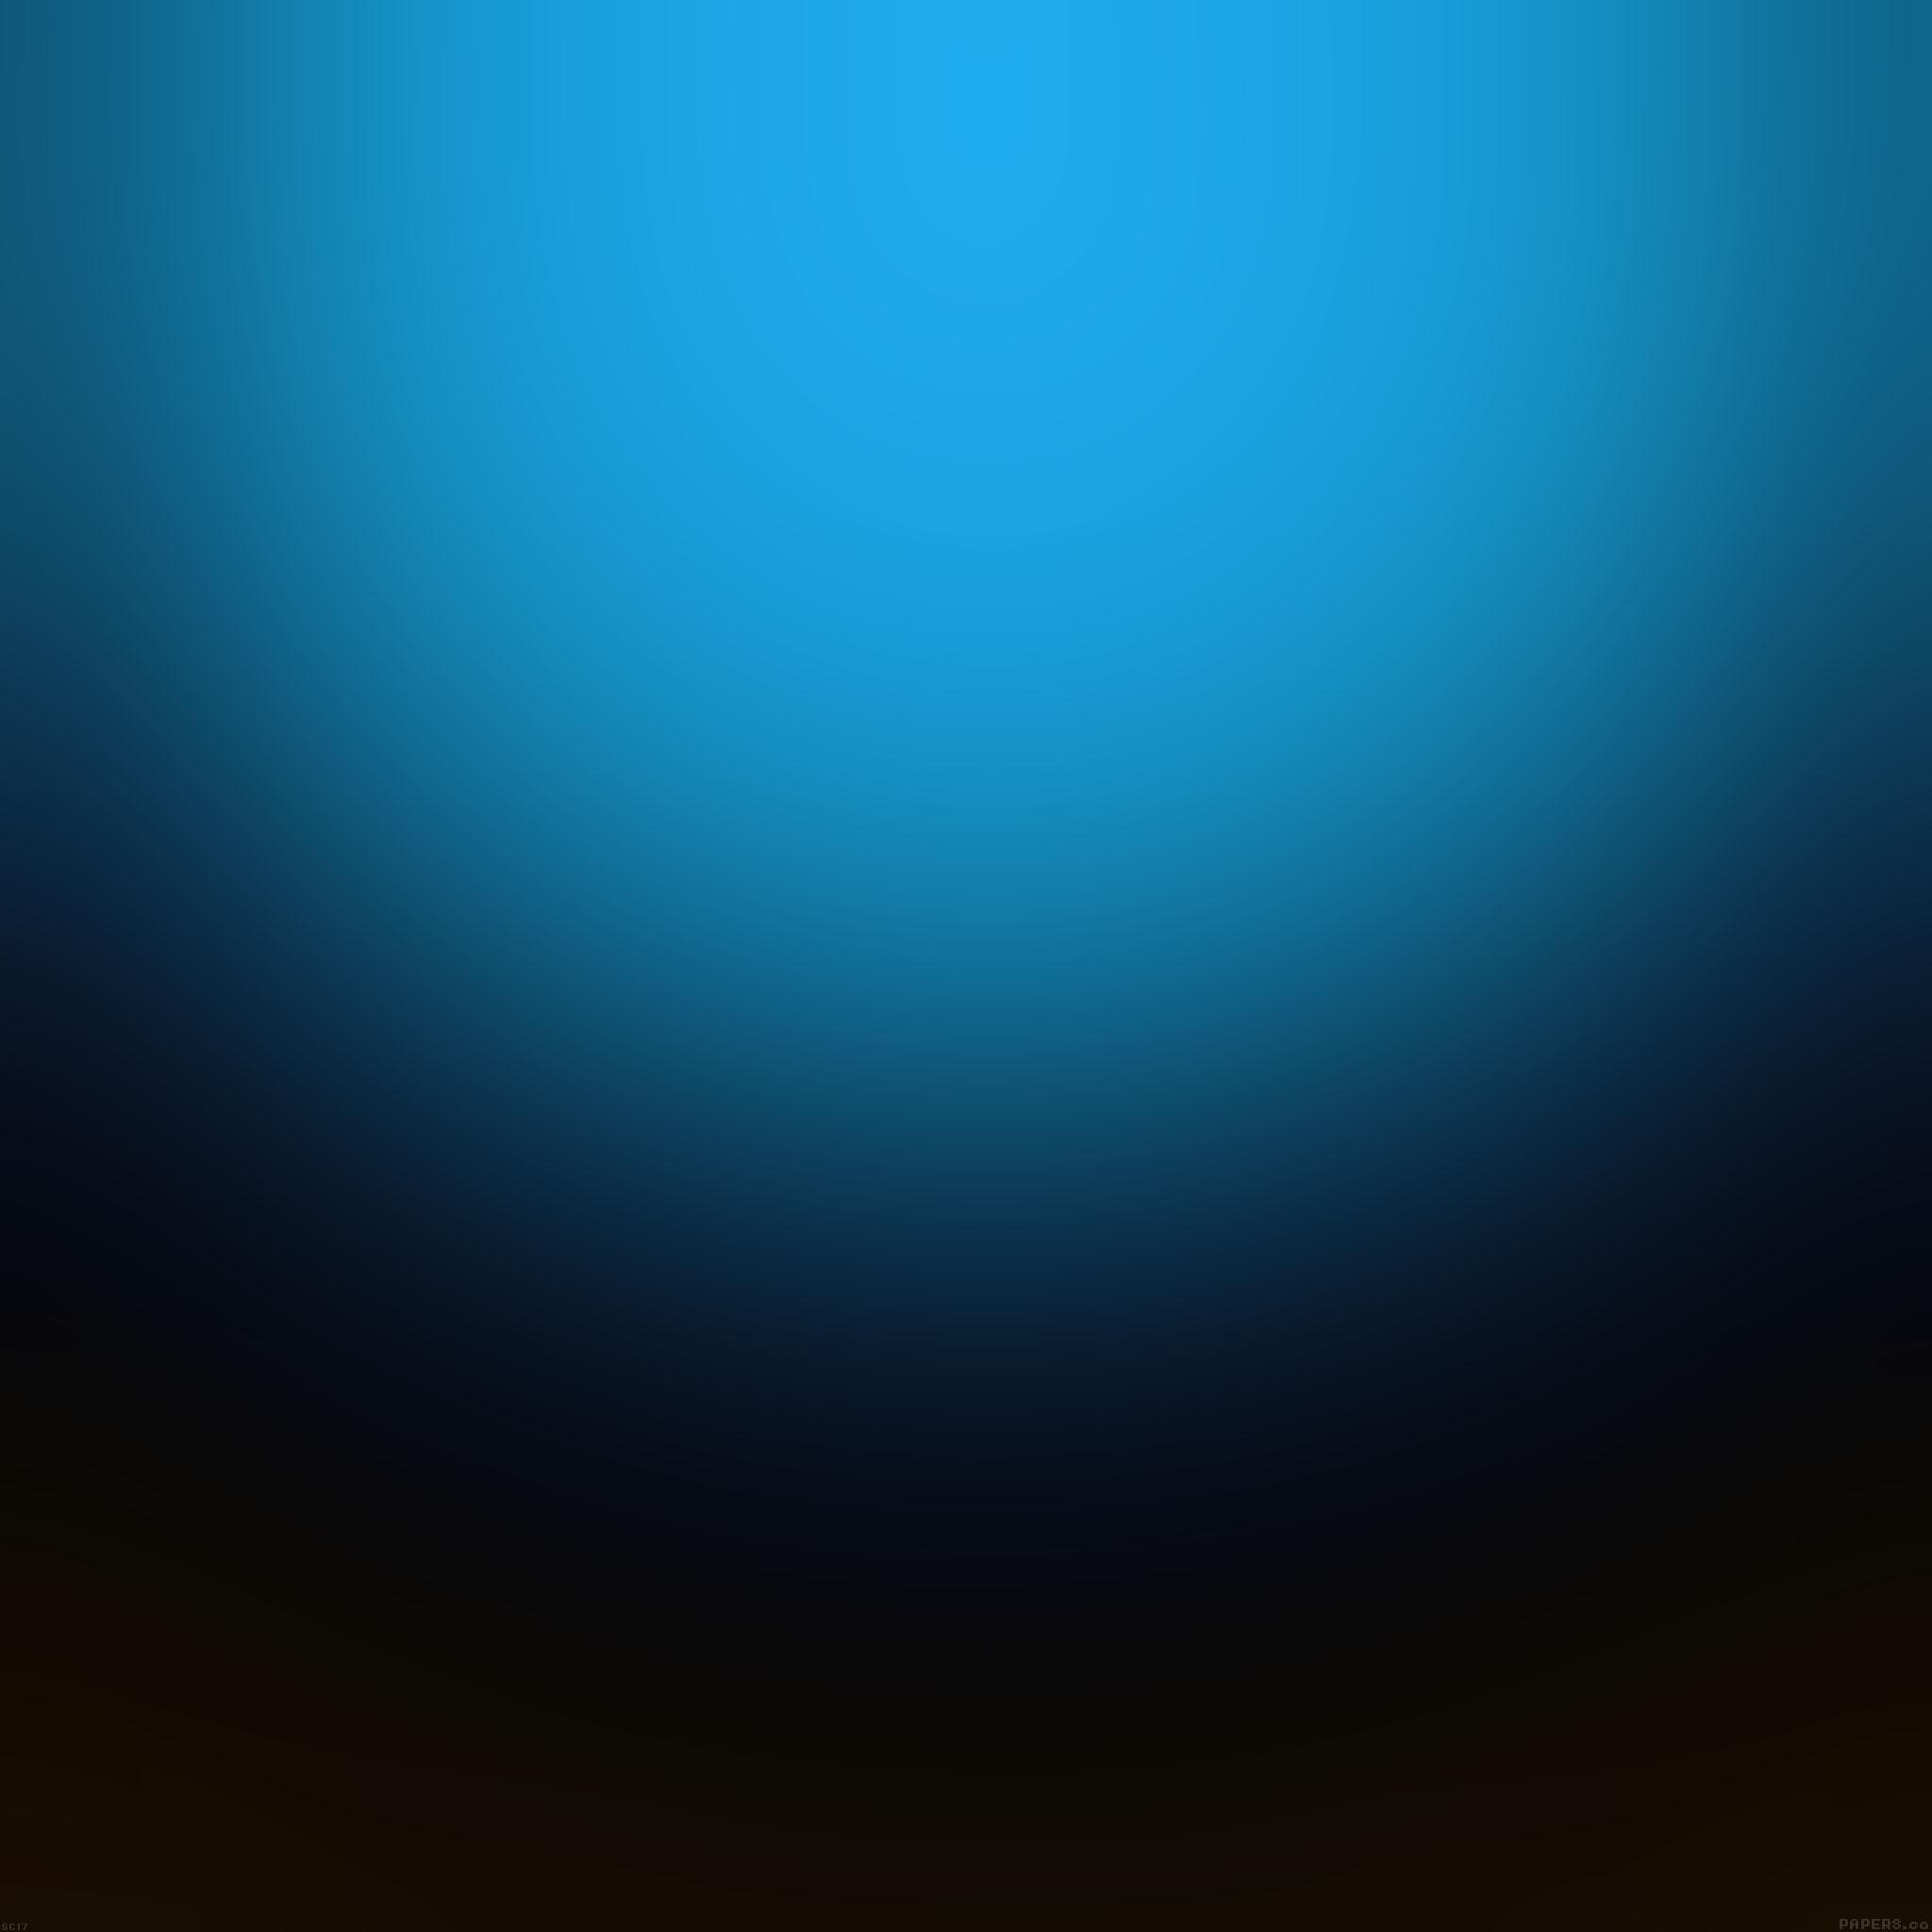 Hd Car Wallpapers For Nexus 5 Sc17 Ocean Deep Water Blur Papers Co